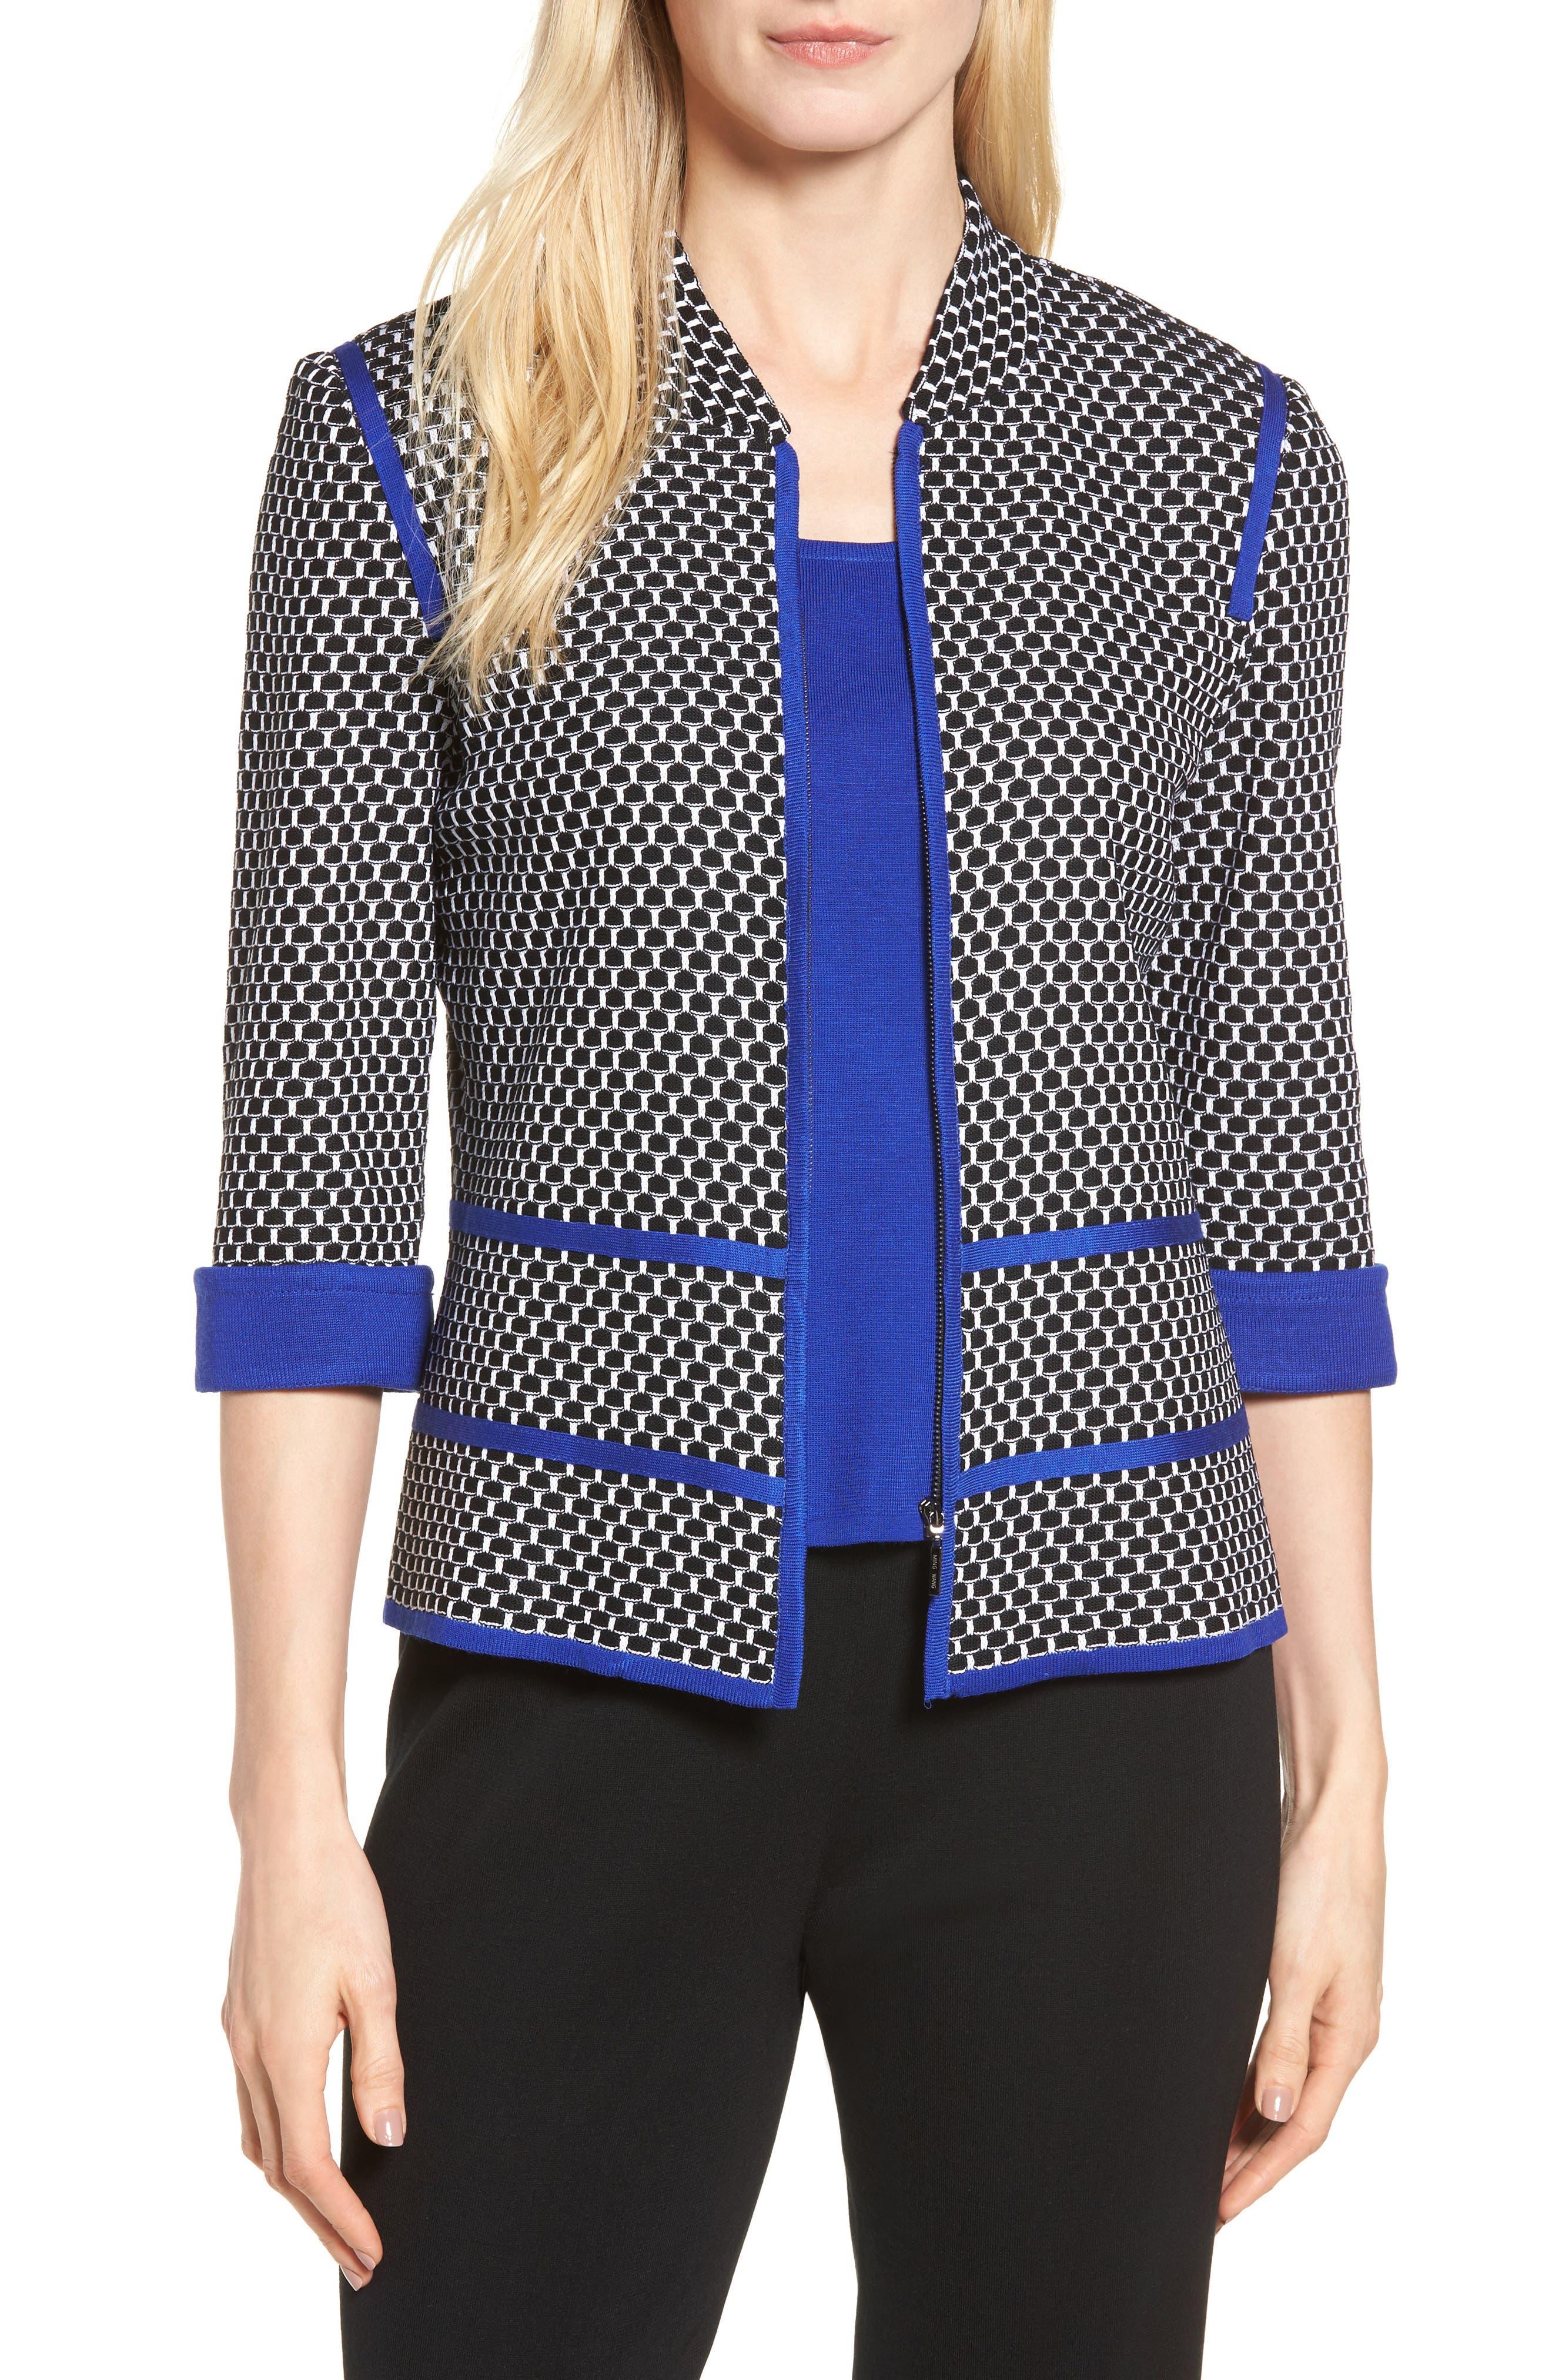 Jacquard Knit Jacket,                             Main thumbnail 1, color,                             407